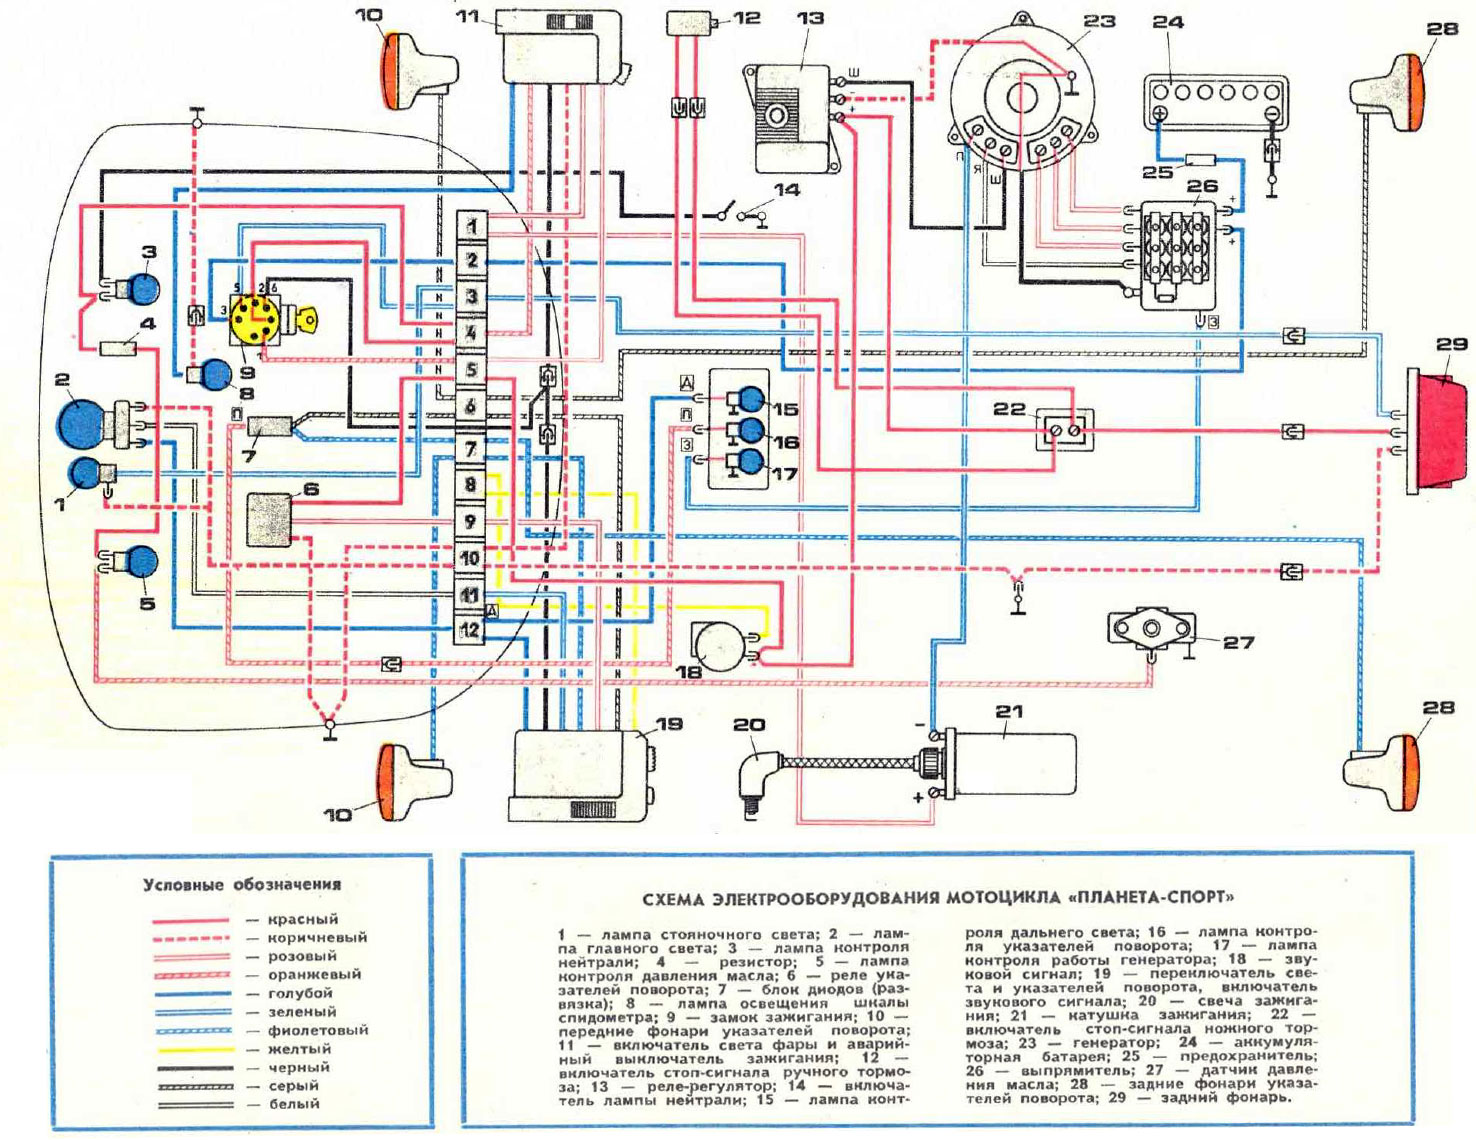 Иж юпитер 4 схема электрооборудования